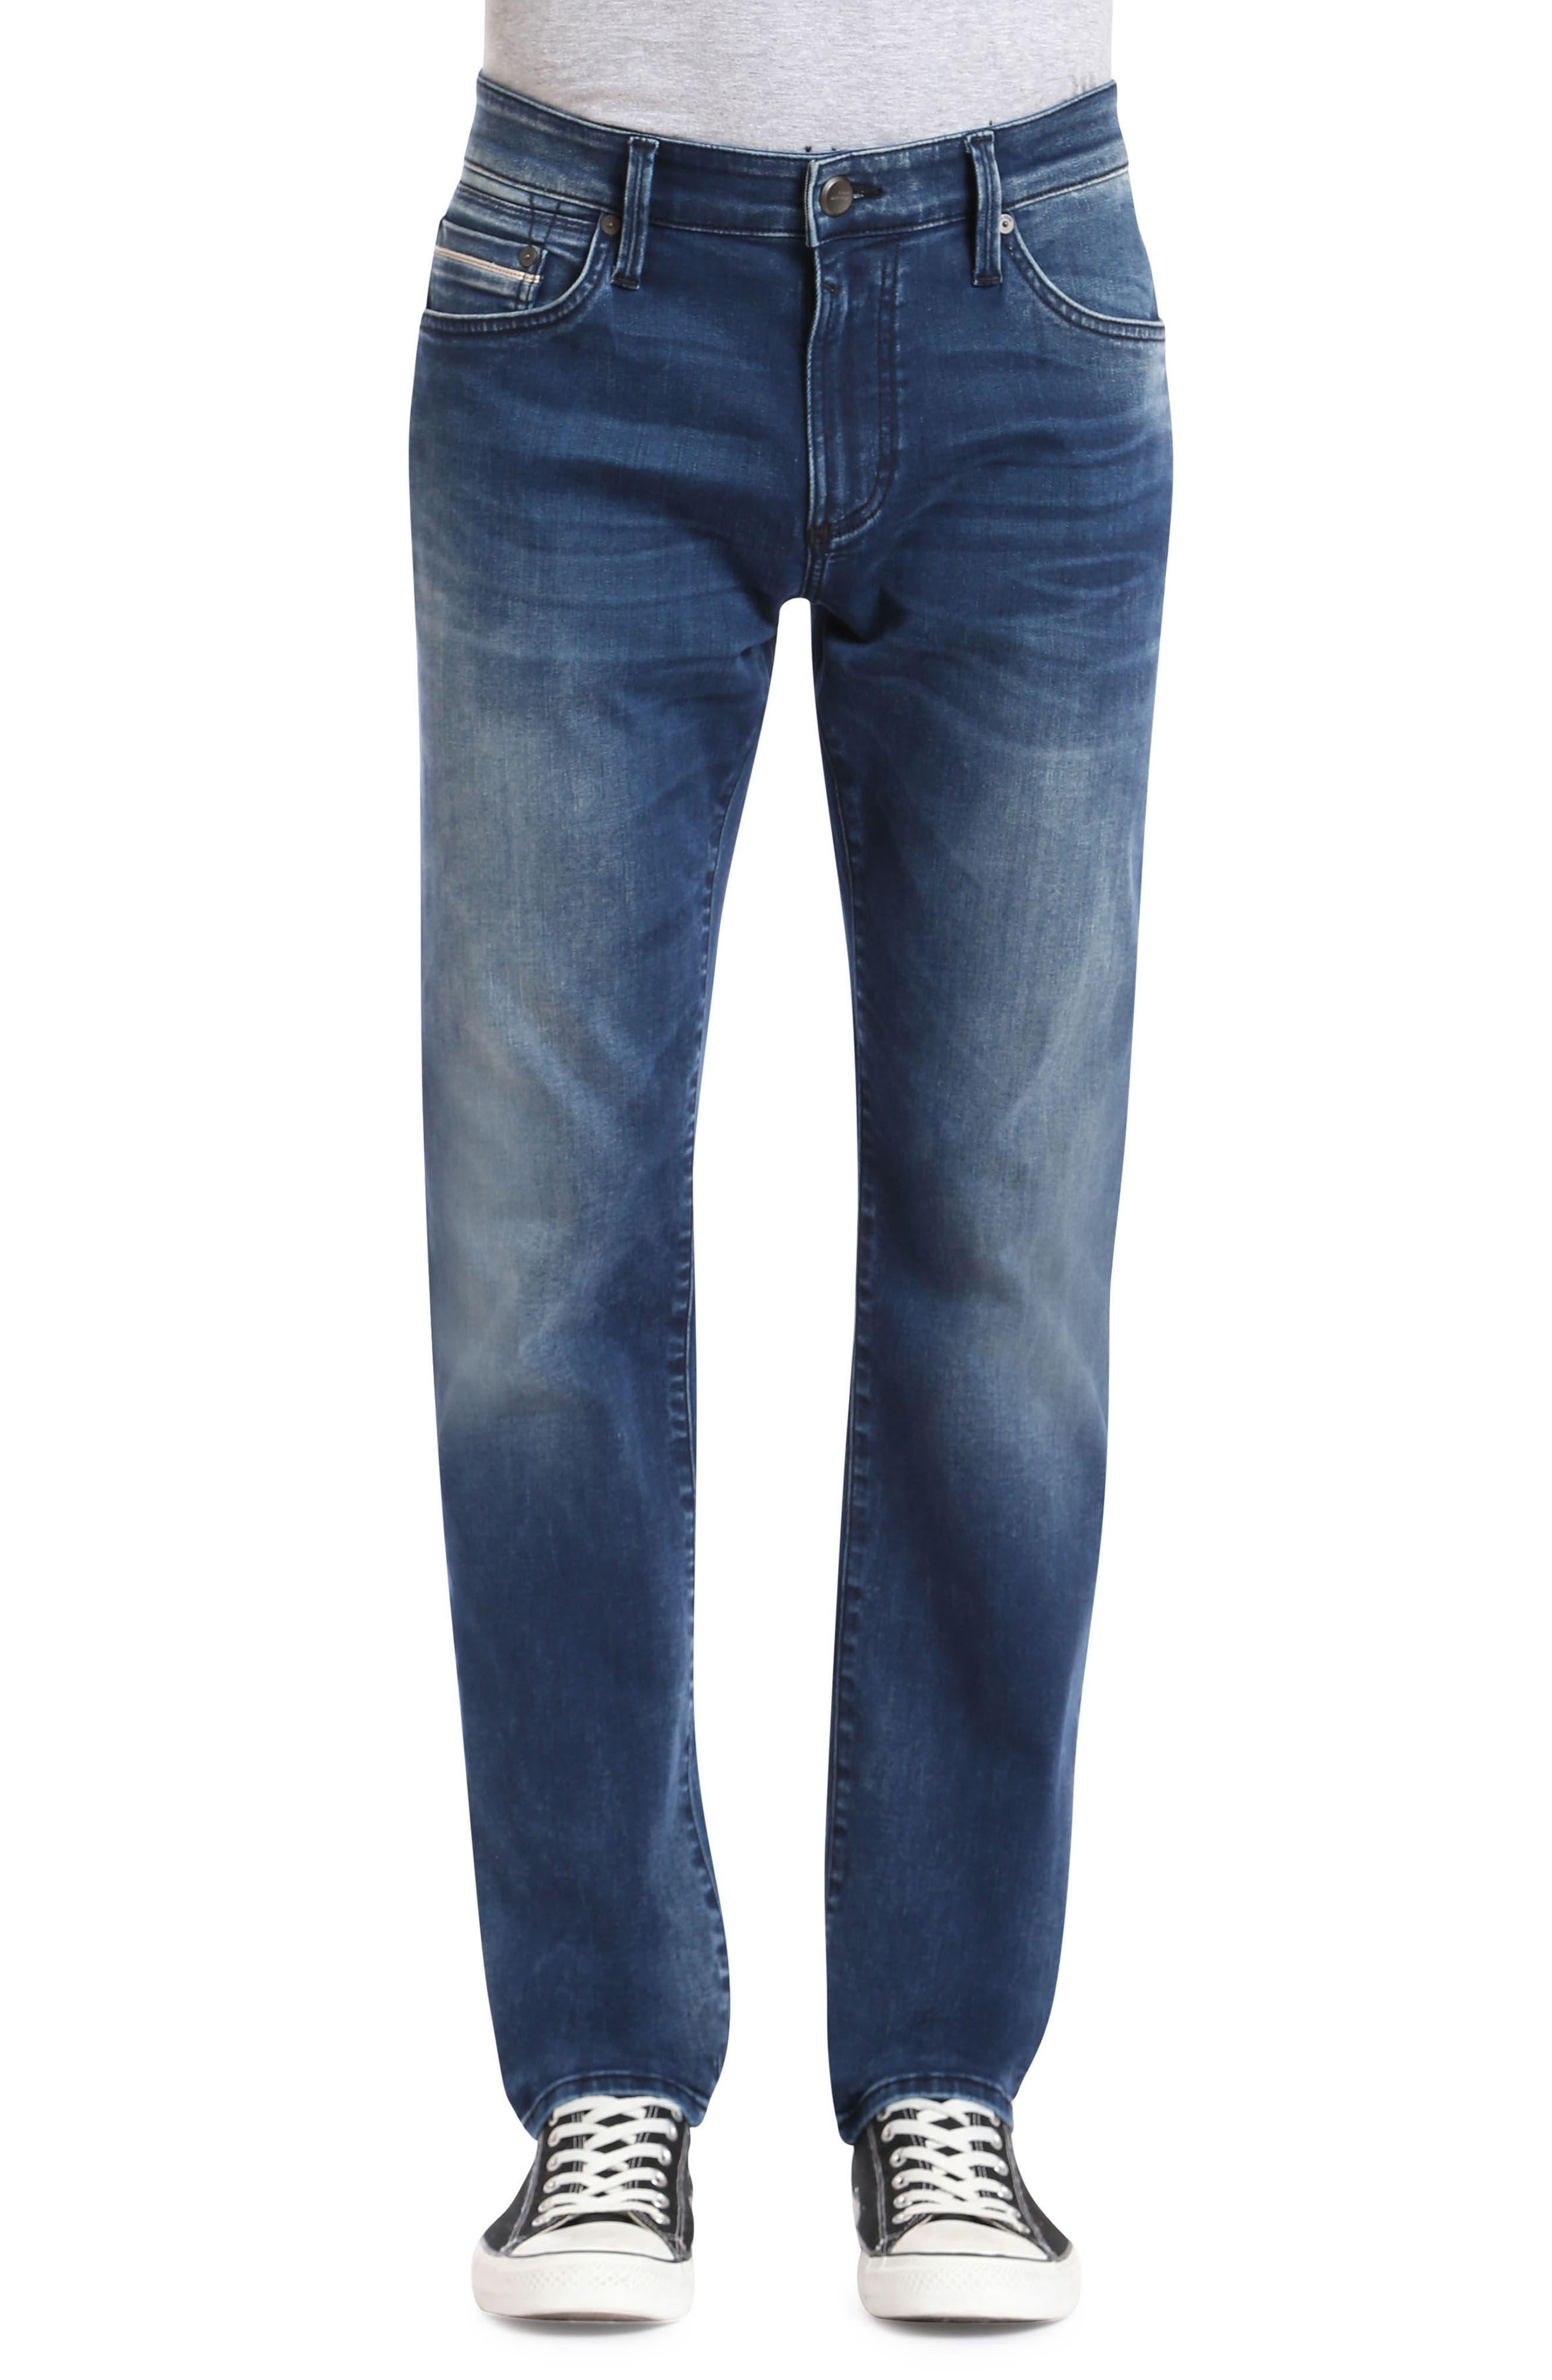 Marcus Slim Straight Leg Jeans,                             Main thumbnail 1, color,                             400